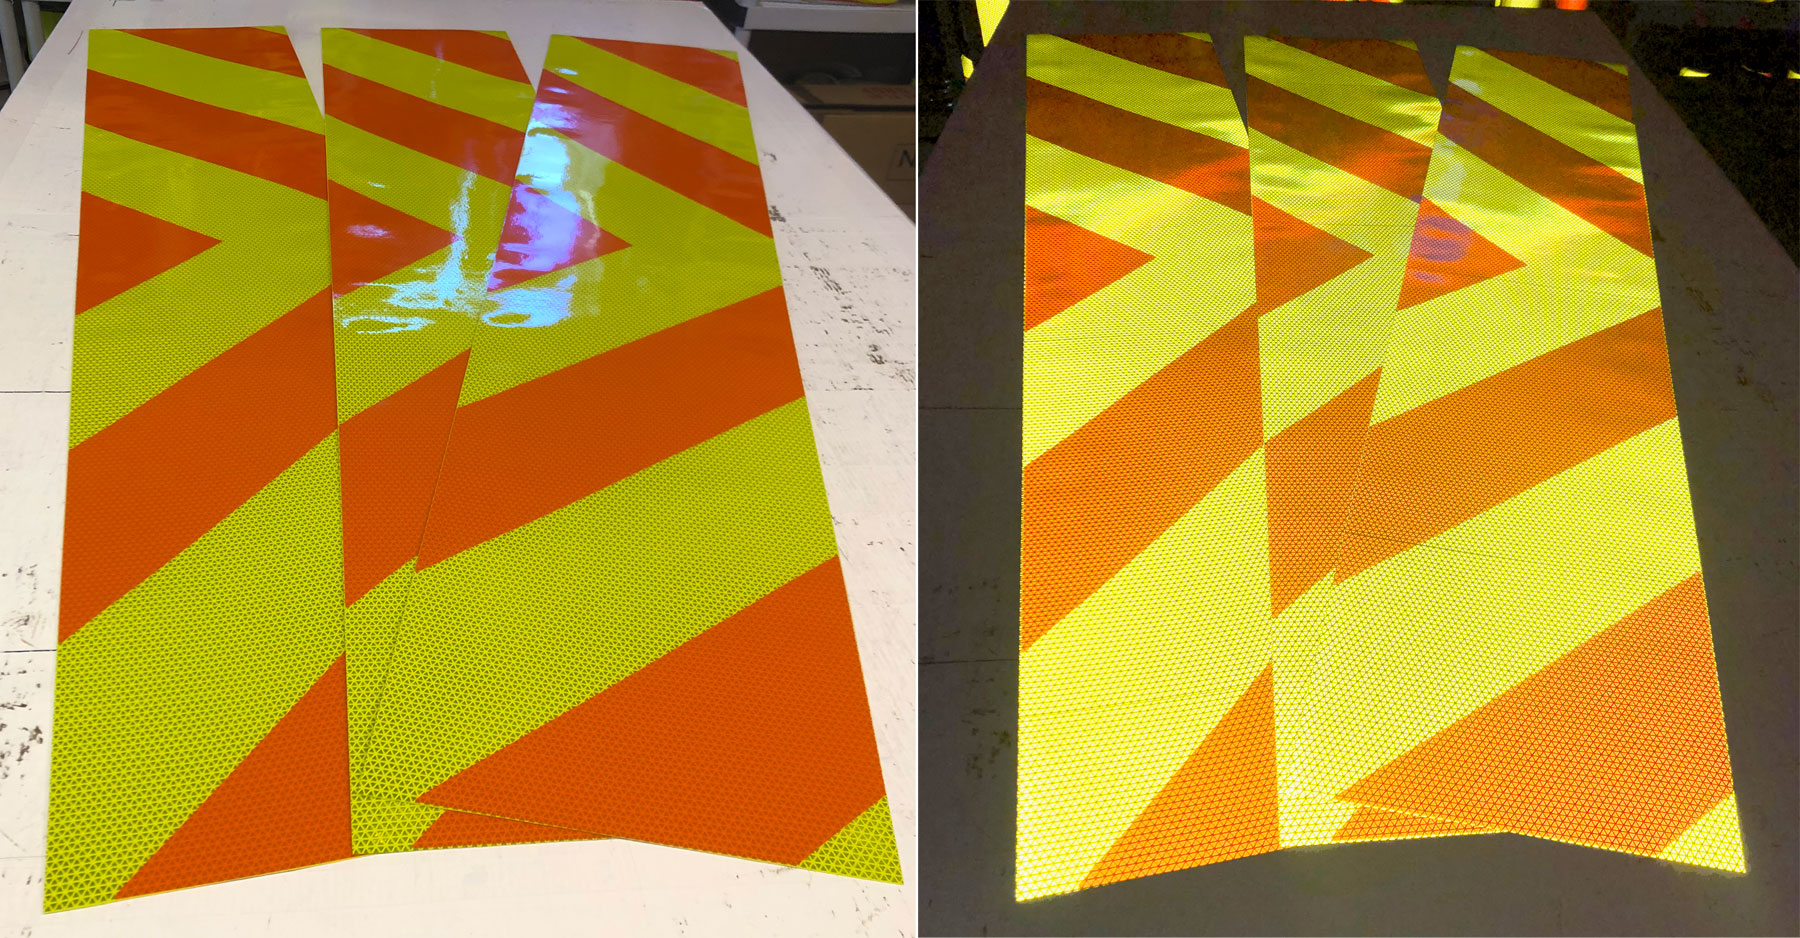 Orange and Fluorescent Lime Reflective Chevron Panel